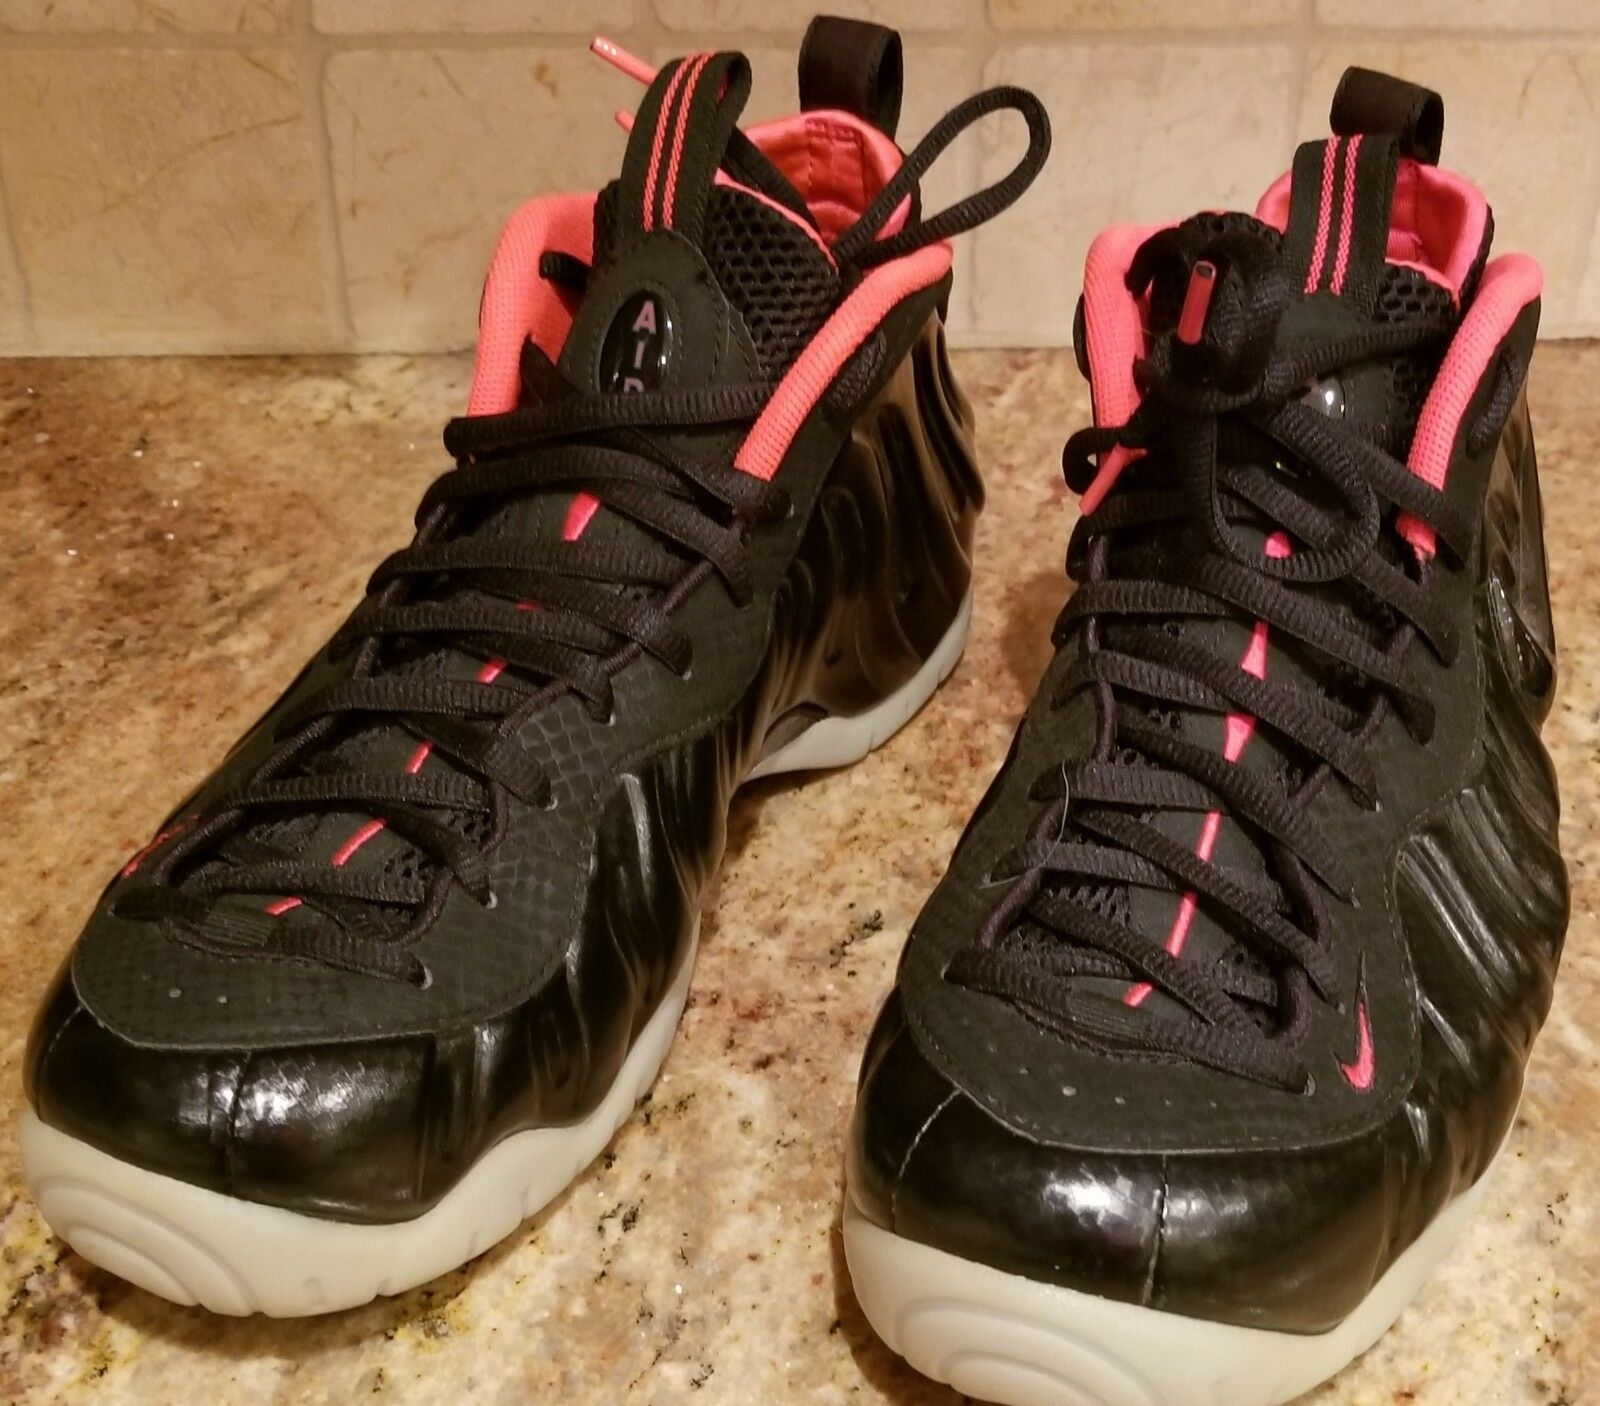 ec491a688876 Nike Air Air Air Foamposite Pro PRM Yeezy Black Black Laser Crimson 616750  001 Sneakers d97246